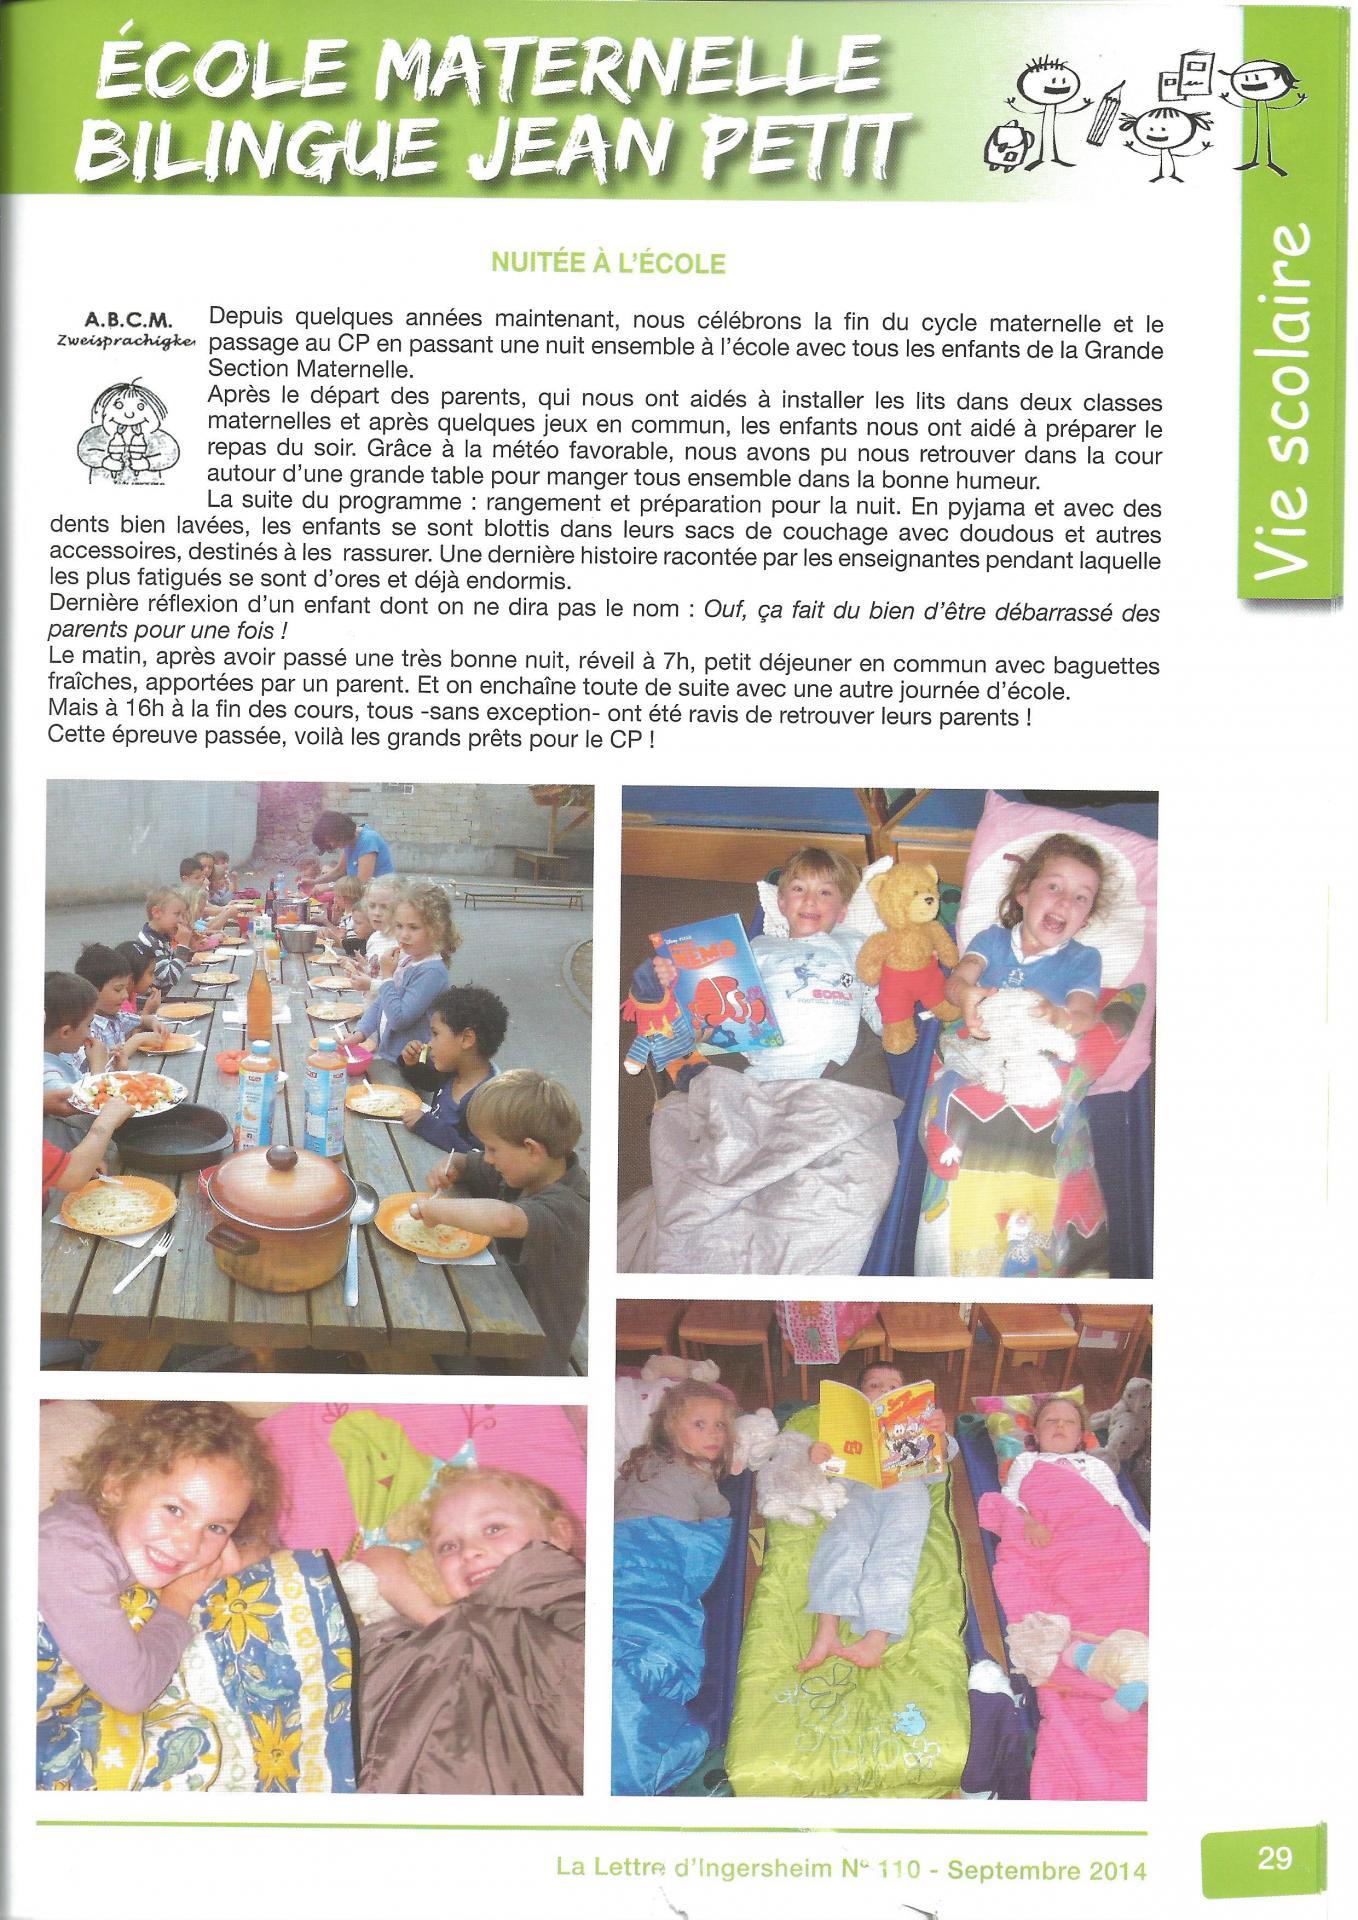 2014 09 lettre ingersheim nuit ecole 1